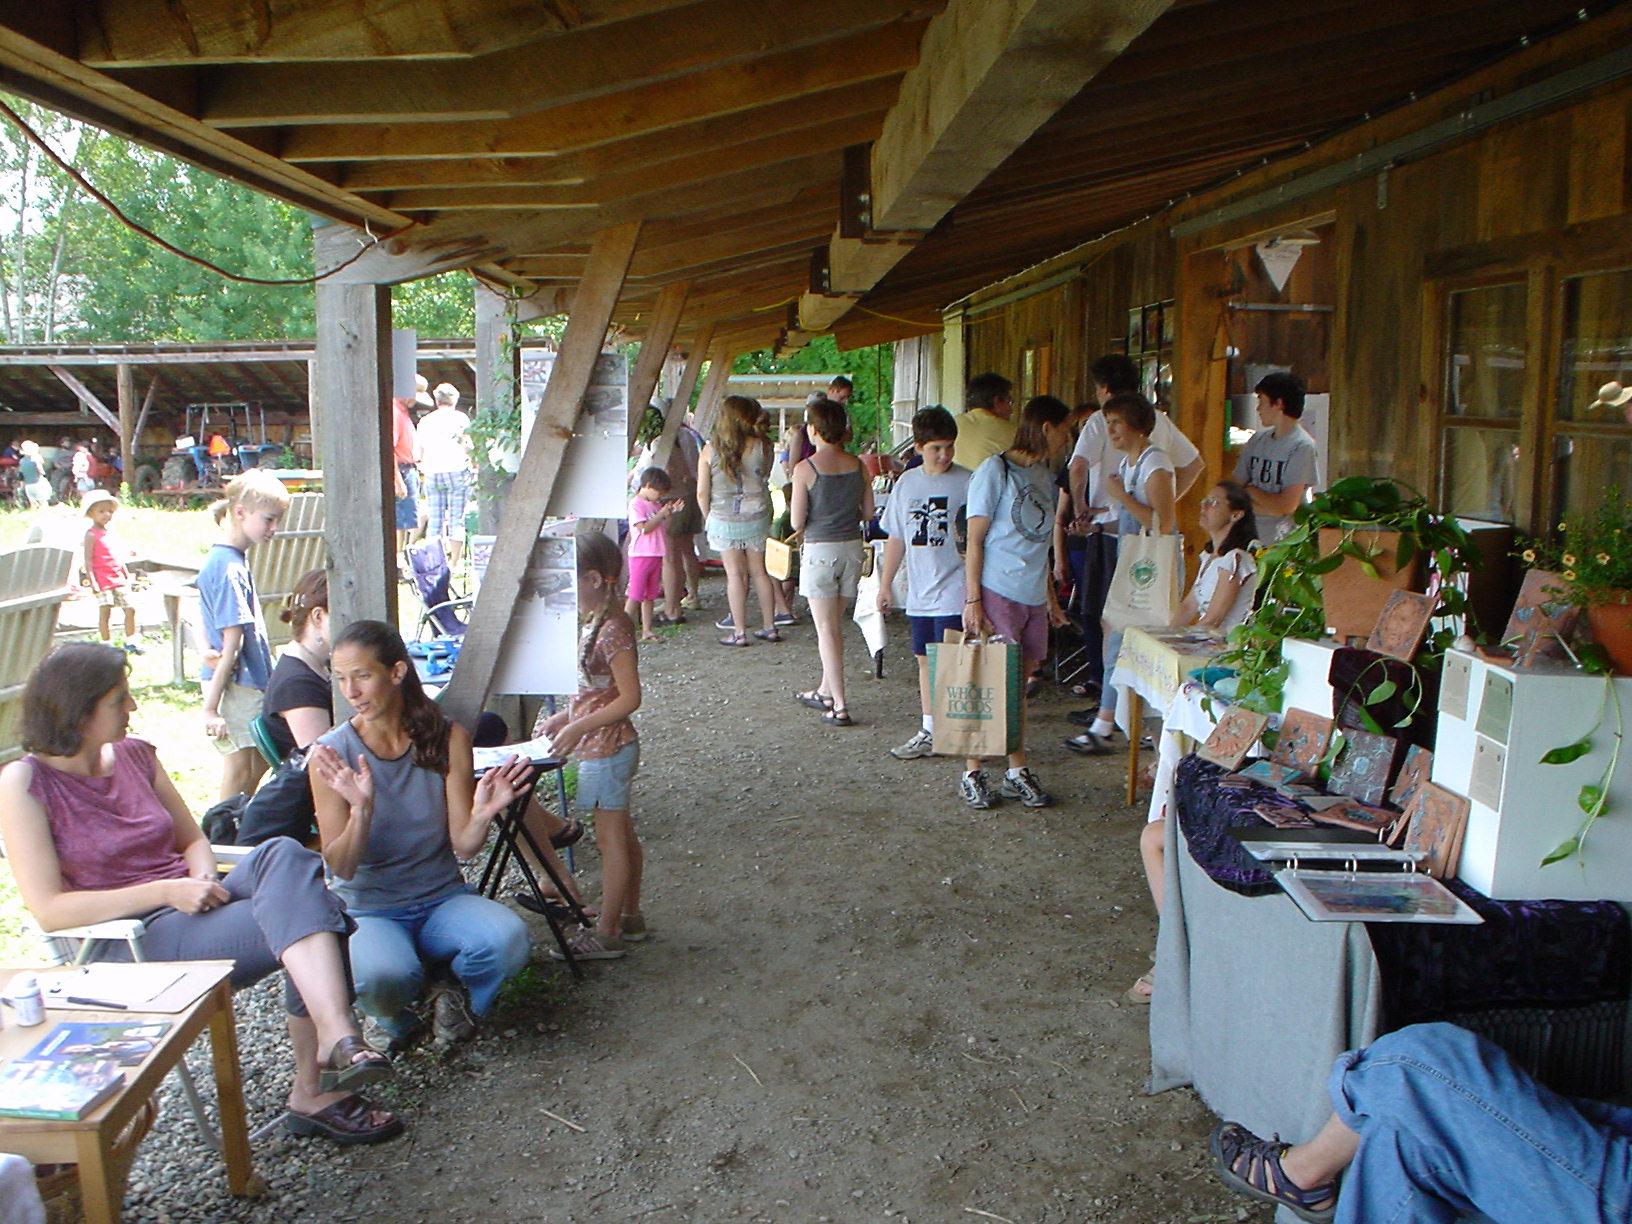 Art Behind The Barn